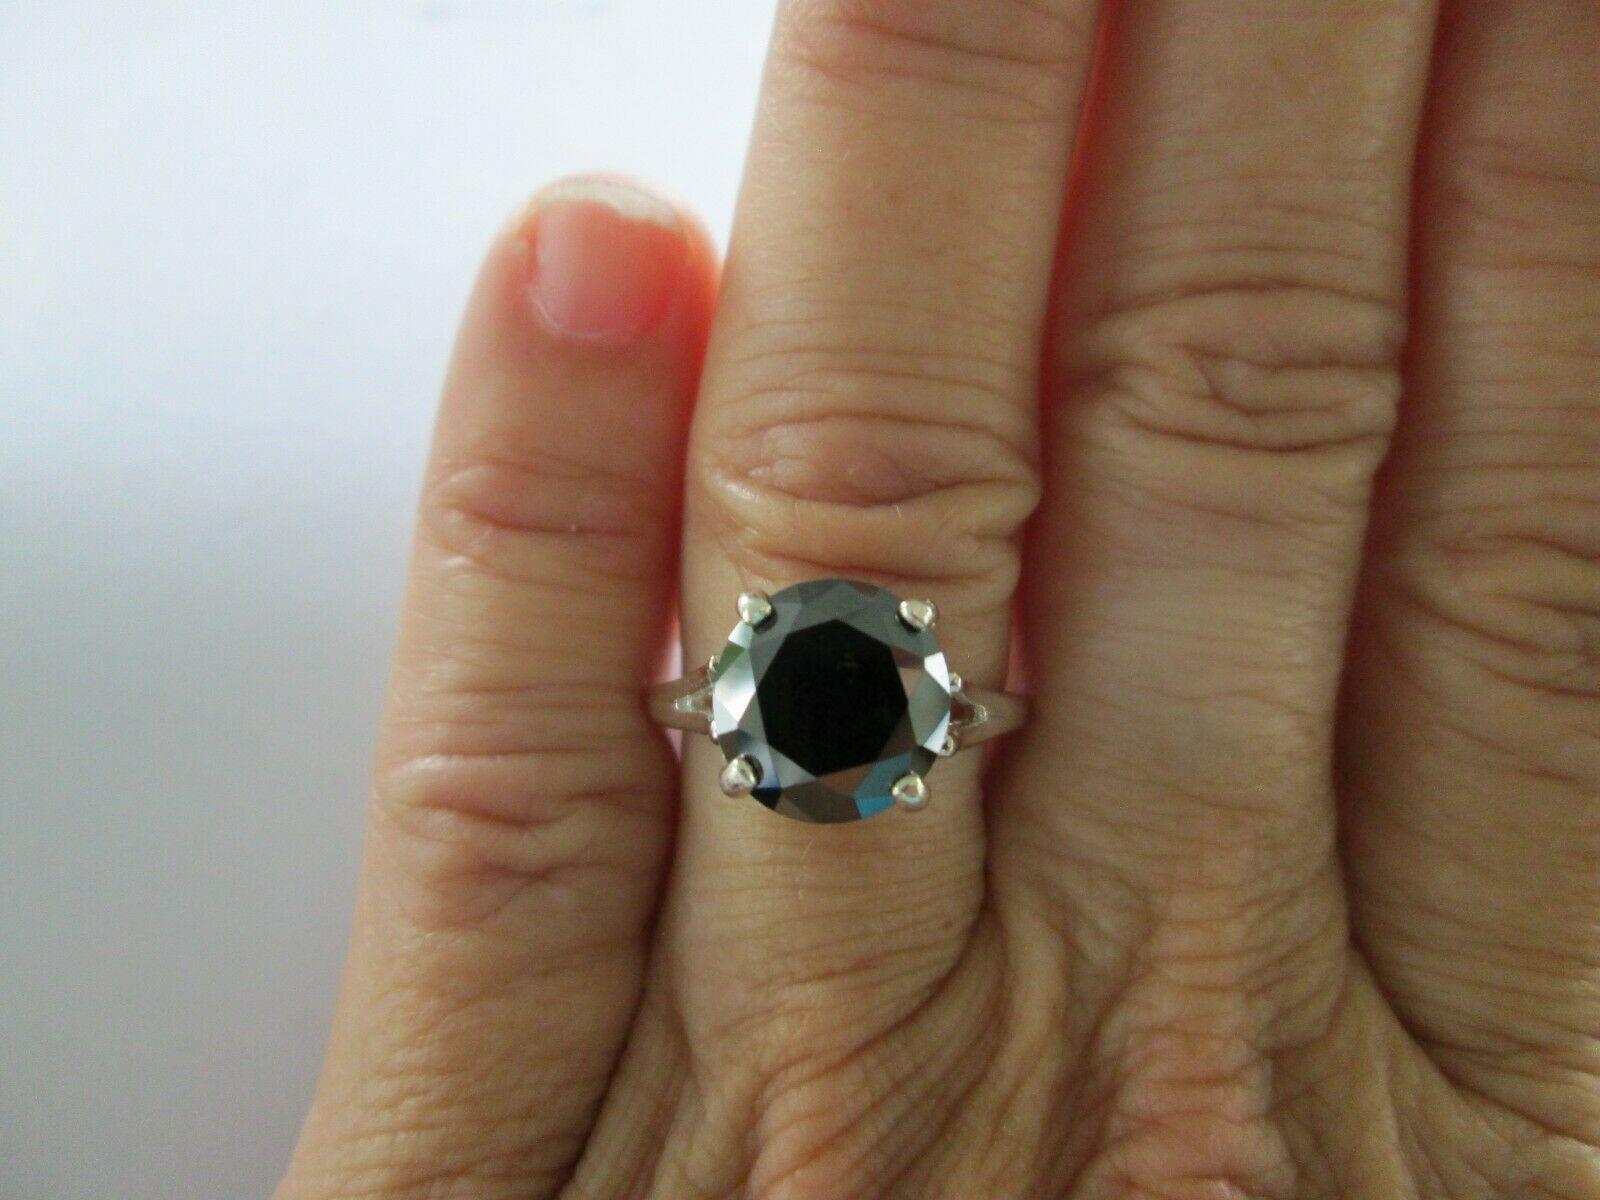 3 0ct Natural Black Diamond Ringcertificatefree Dia Tester Sizes 5678910 Black Diamond Ring Ideas Of Black Dia Black Diamond Ring Black Rings Diamond Rings